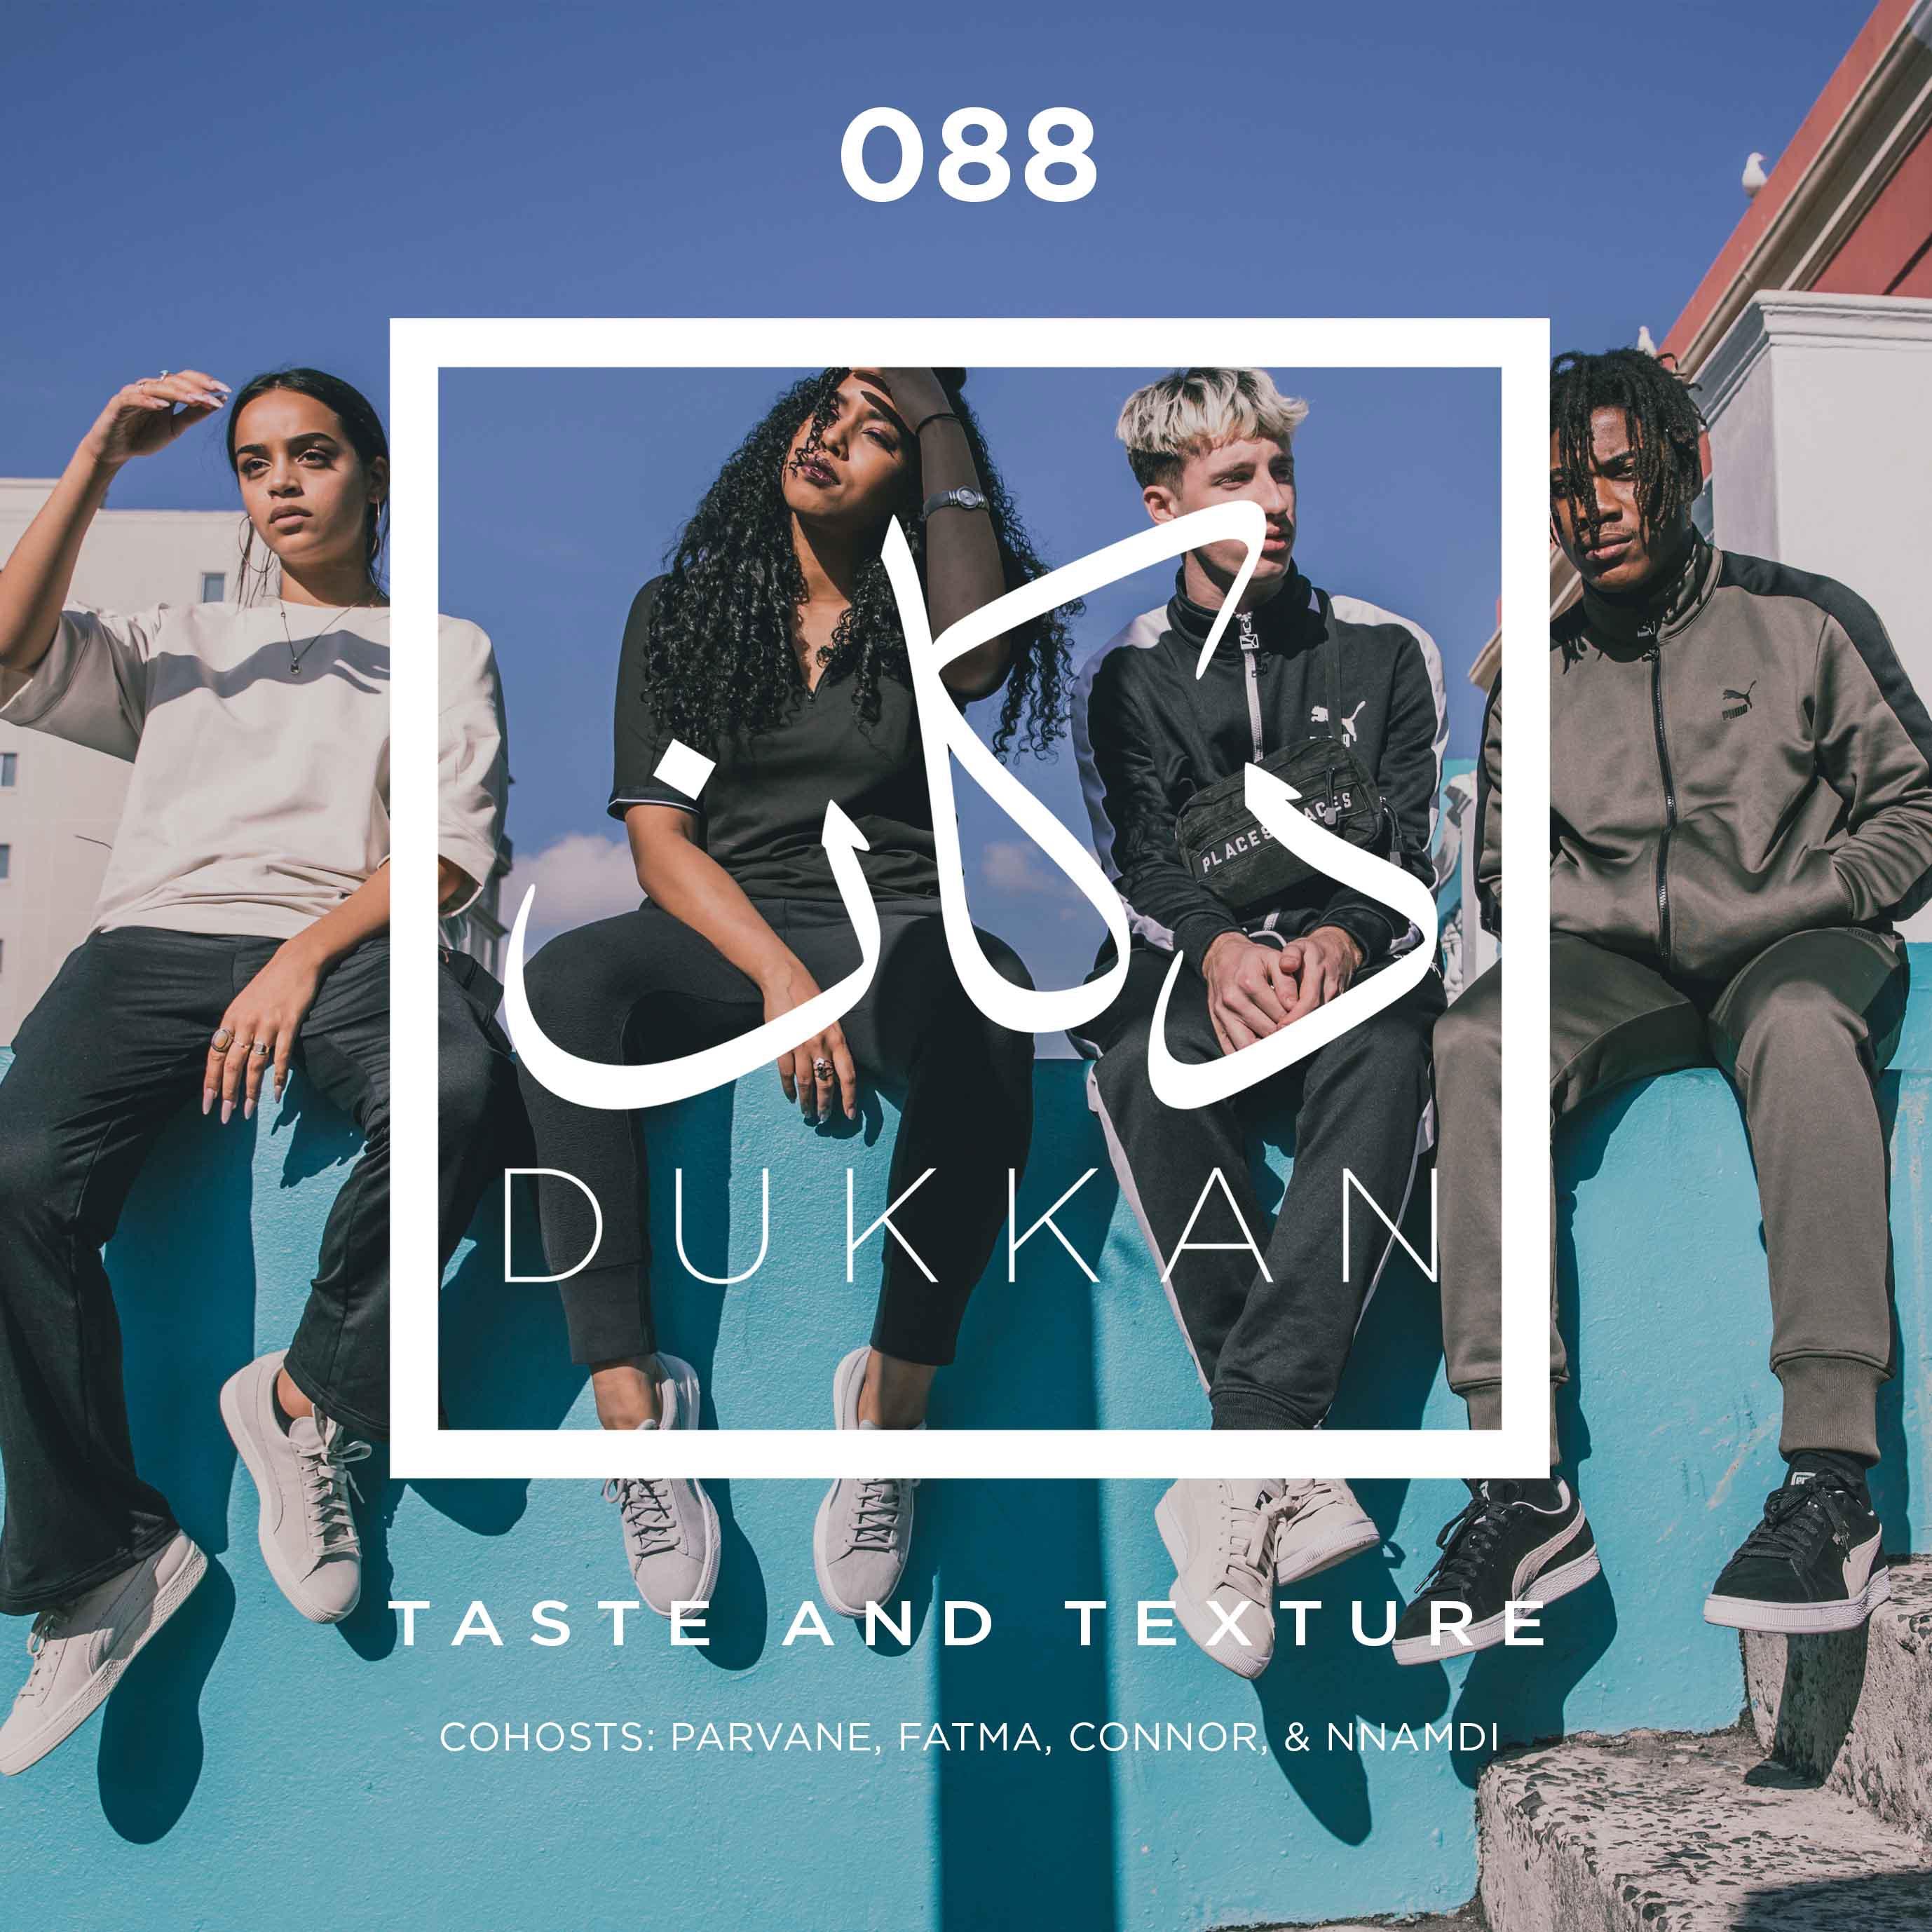 E088: Taste And Texture (Cohosts: Parvane, Fatma, Connor, & Nnamdi)